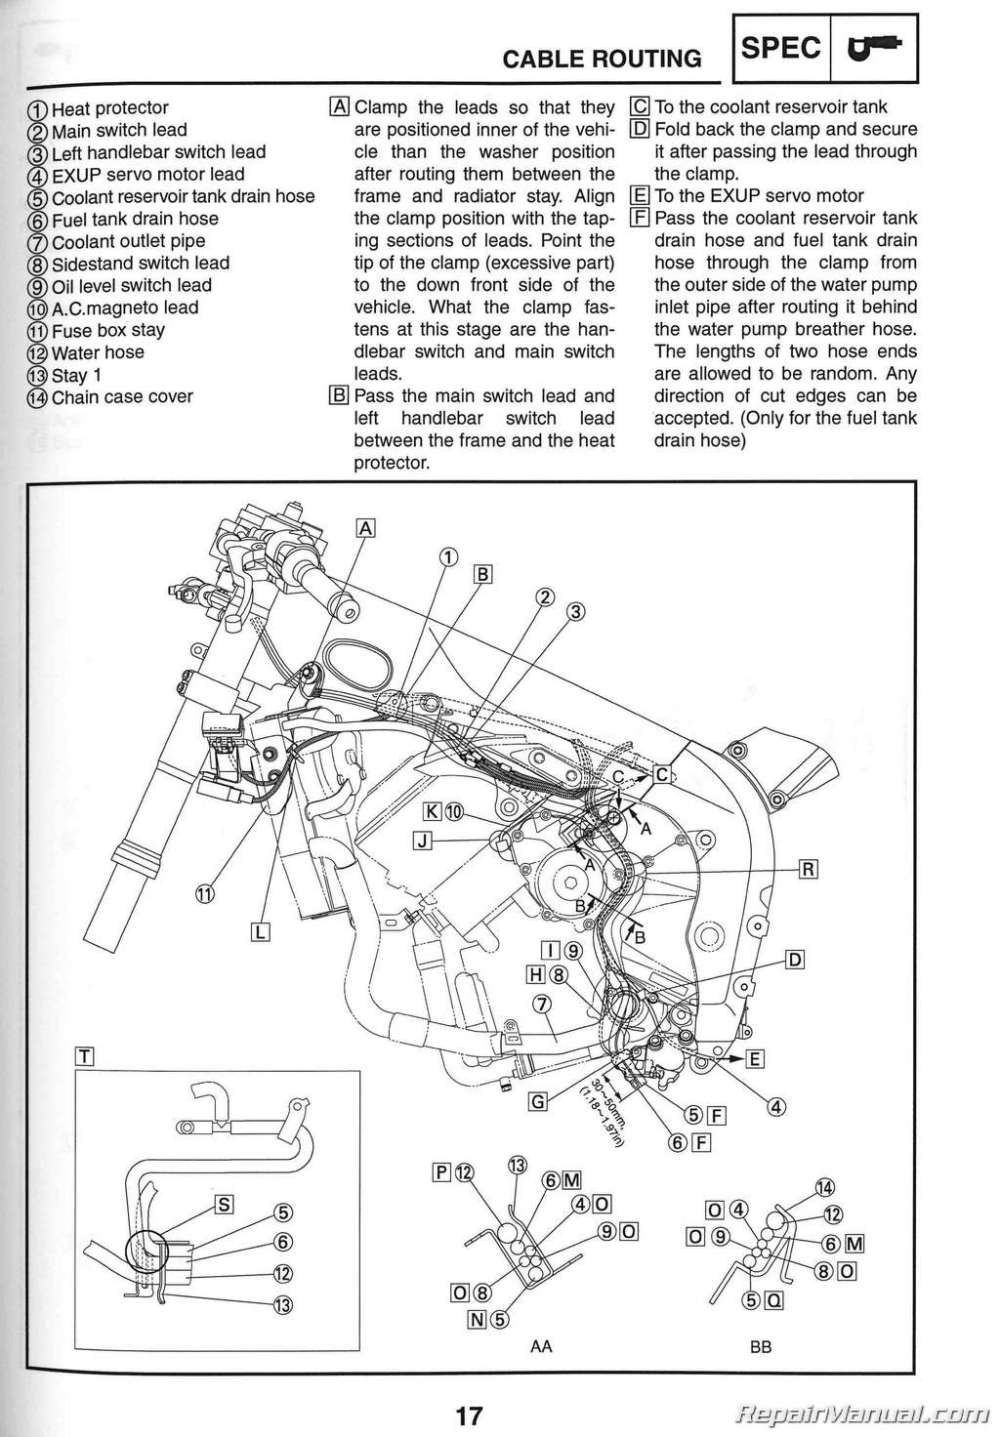 medium resolution of yamaha r1 electrical wiring diagram yzf motorcycle residential yamaha rhino wiring diagram 2007 yamaha r1 wiring diagram